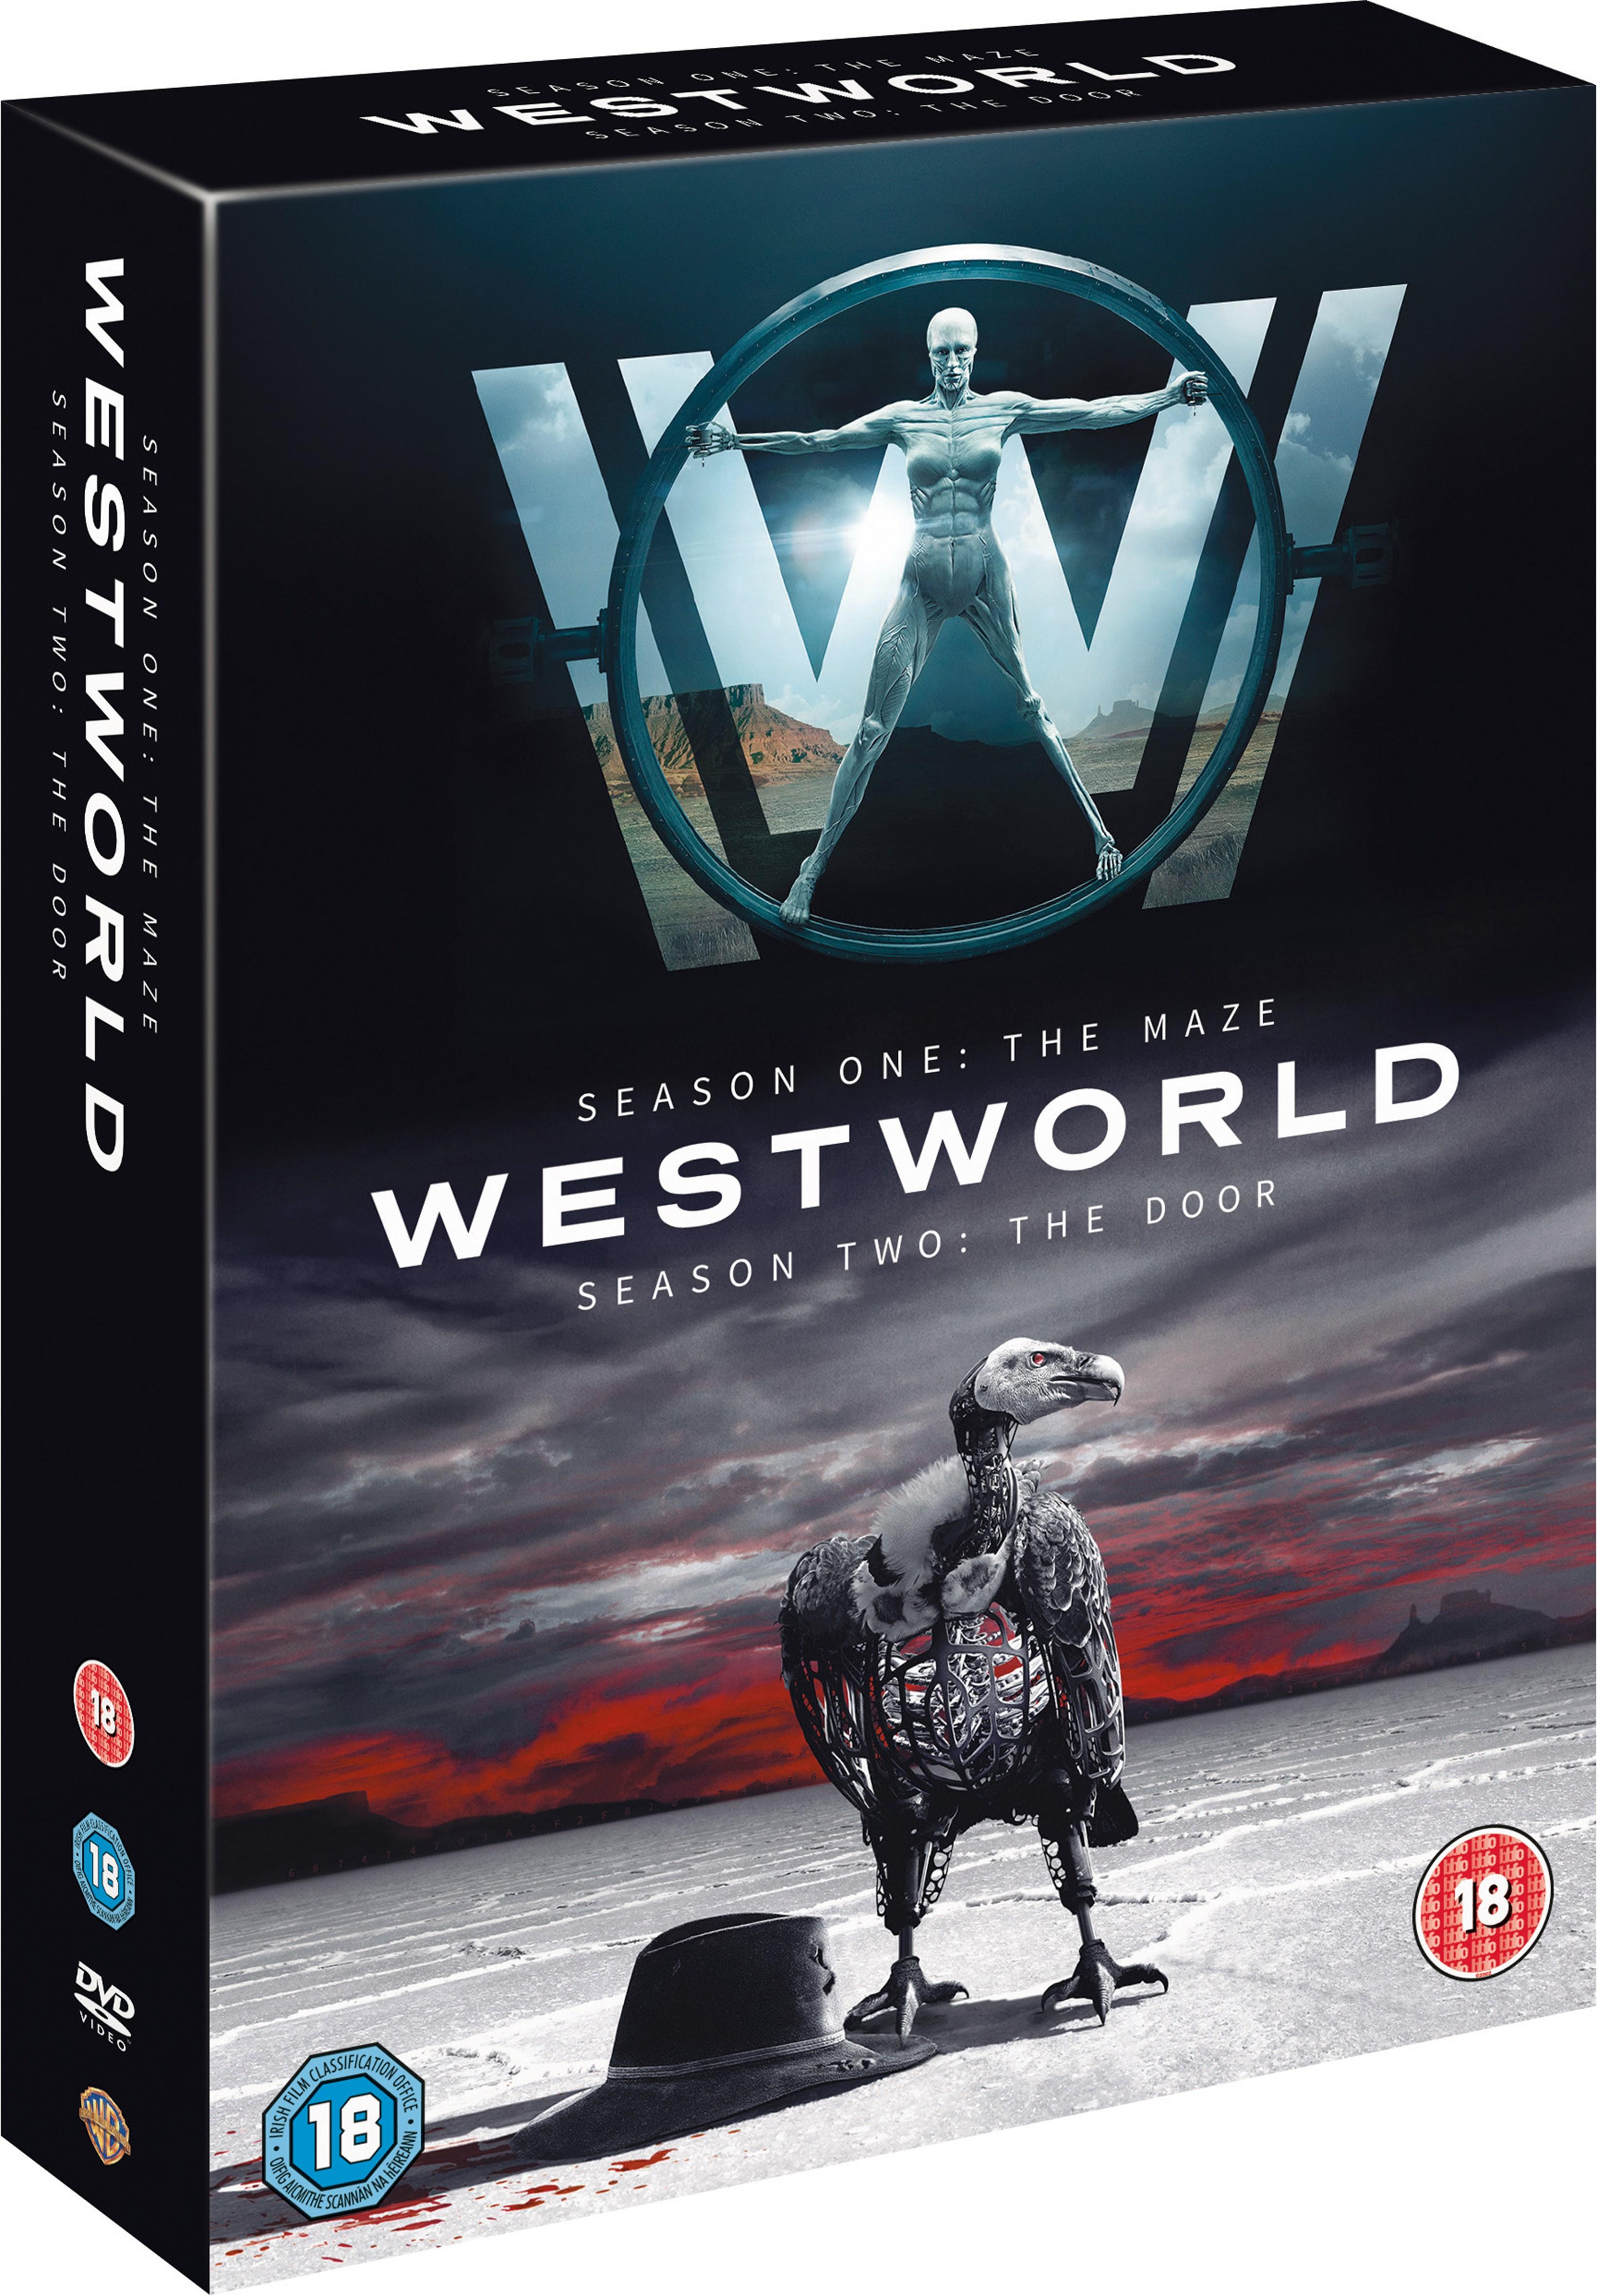 Westworld: Seasons One - The Maze/ Season Two - The Door - 2